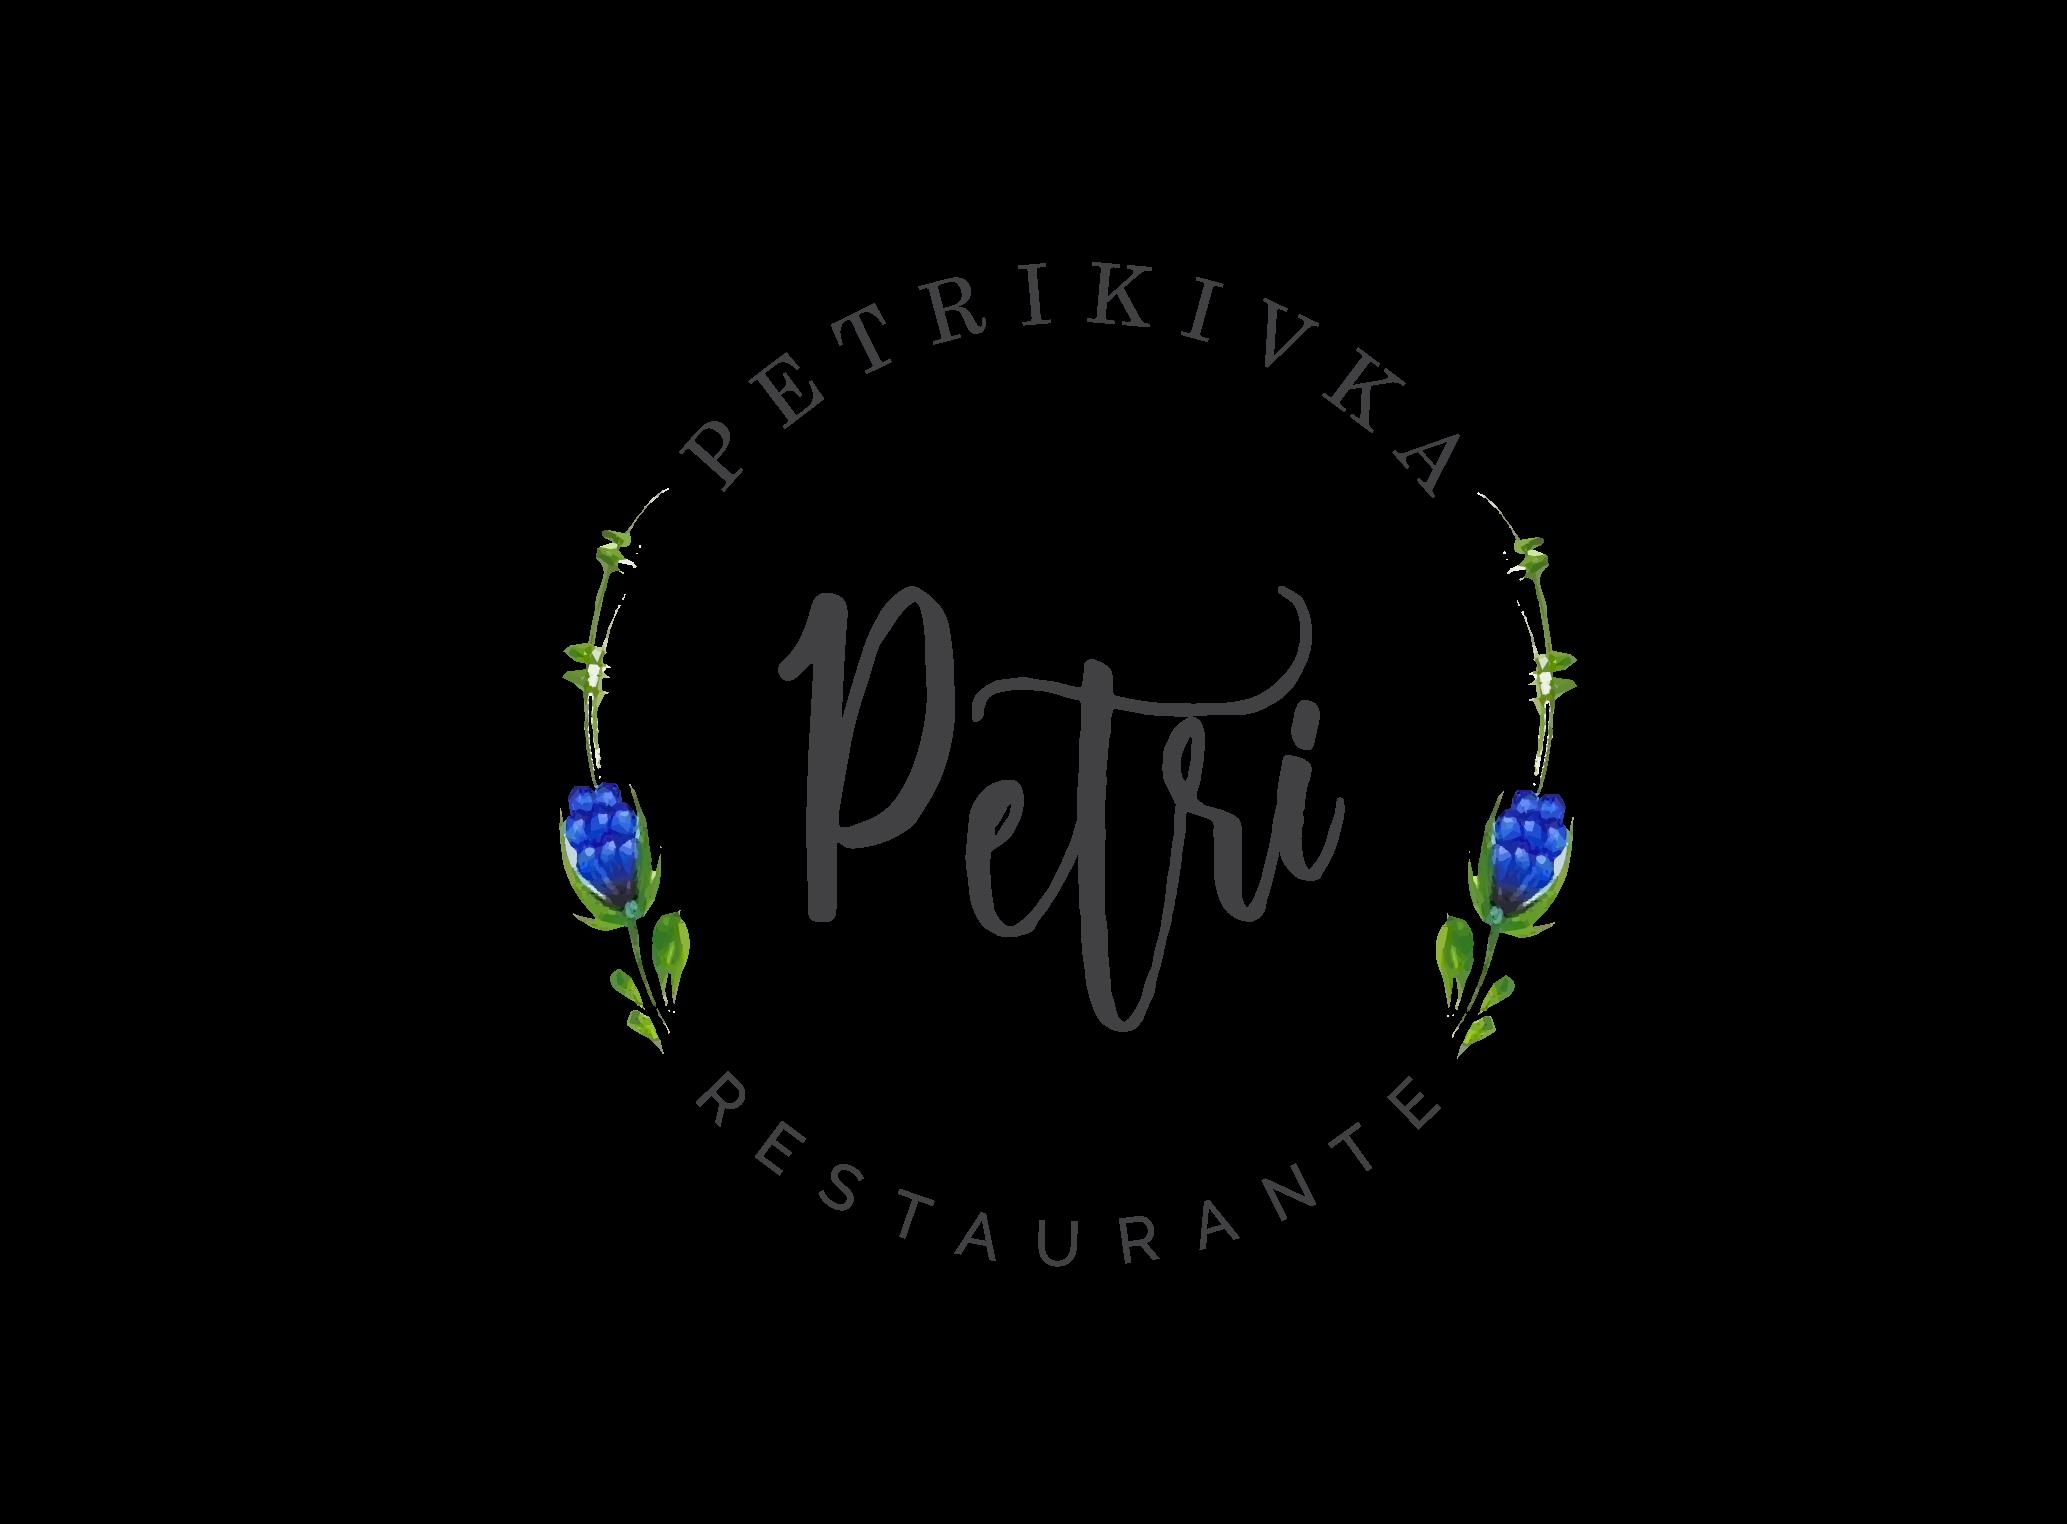 Petri Restaurante